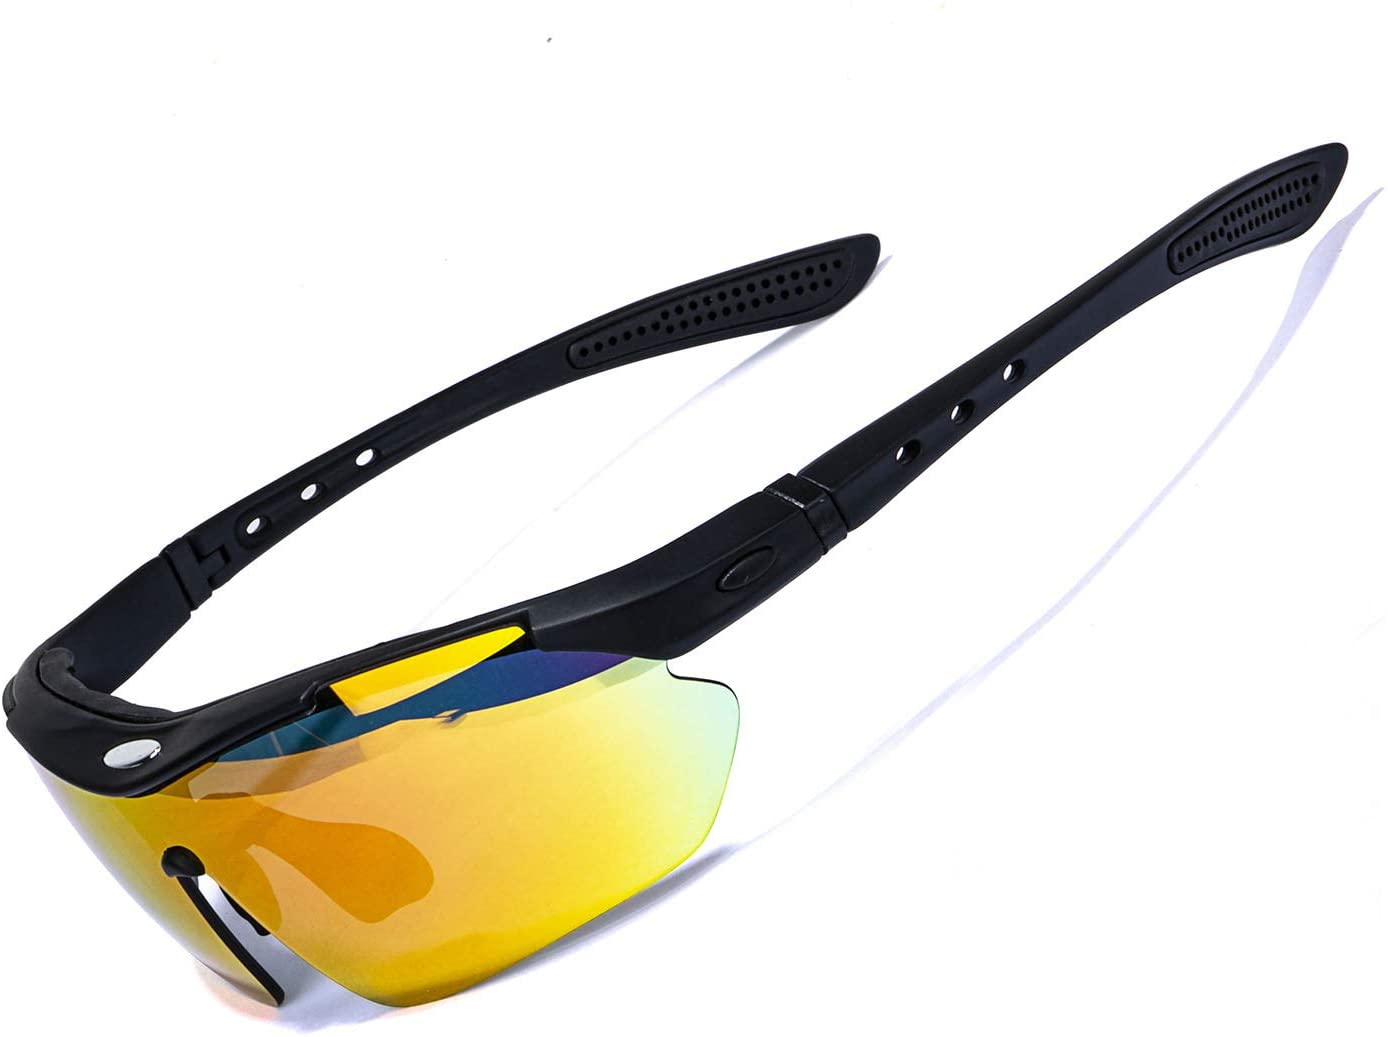 Reksai Cycling Glasses Polarized Sports Sunglasses Driving Hiking Golf Baseball Biking Glasses for Men Women Youth